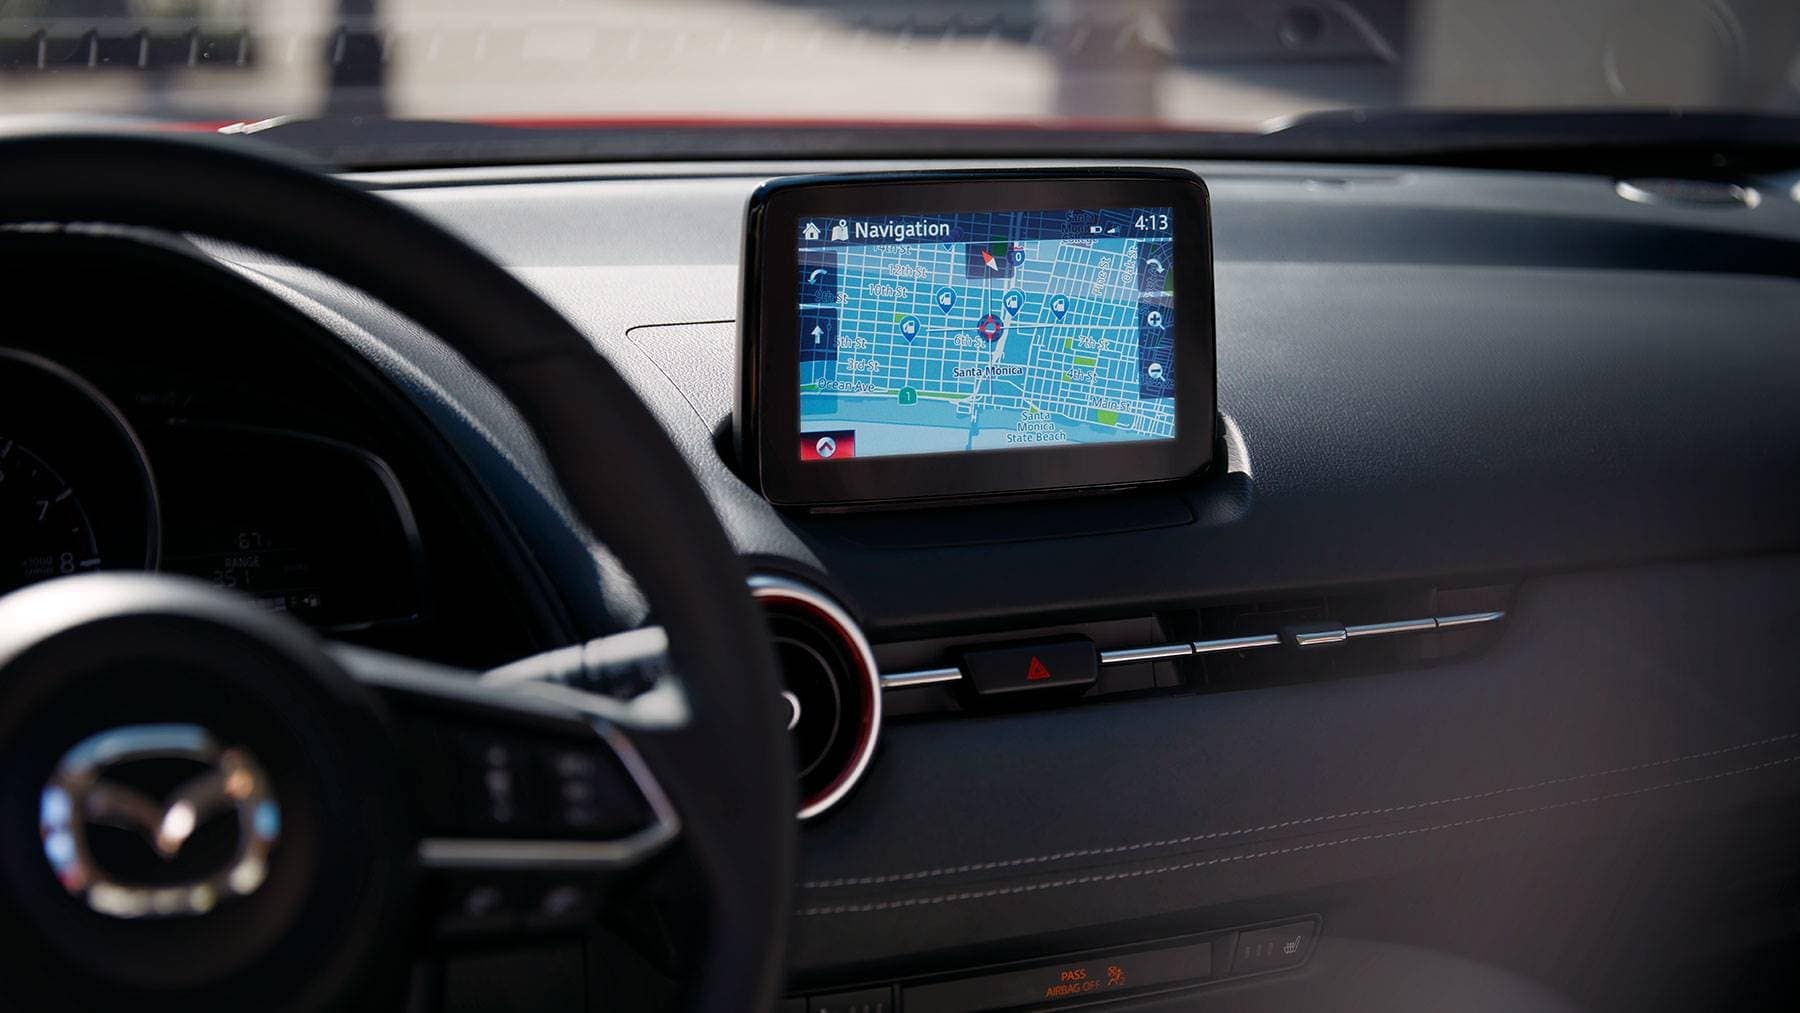 2019 Mazda CX-3 navigation